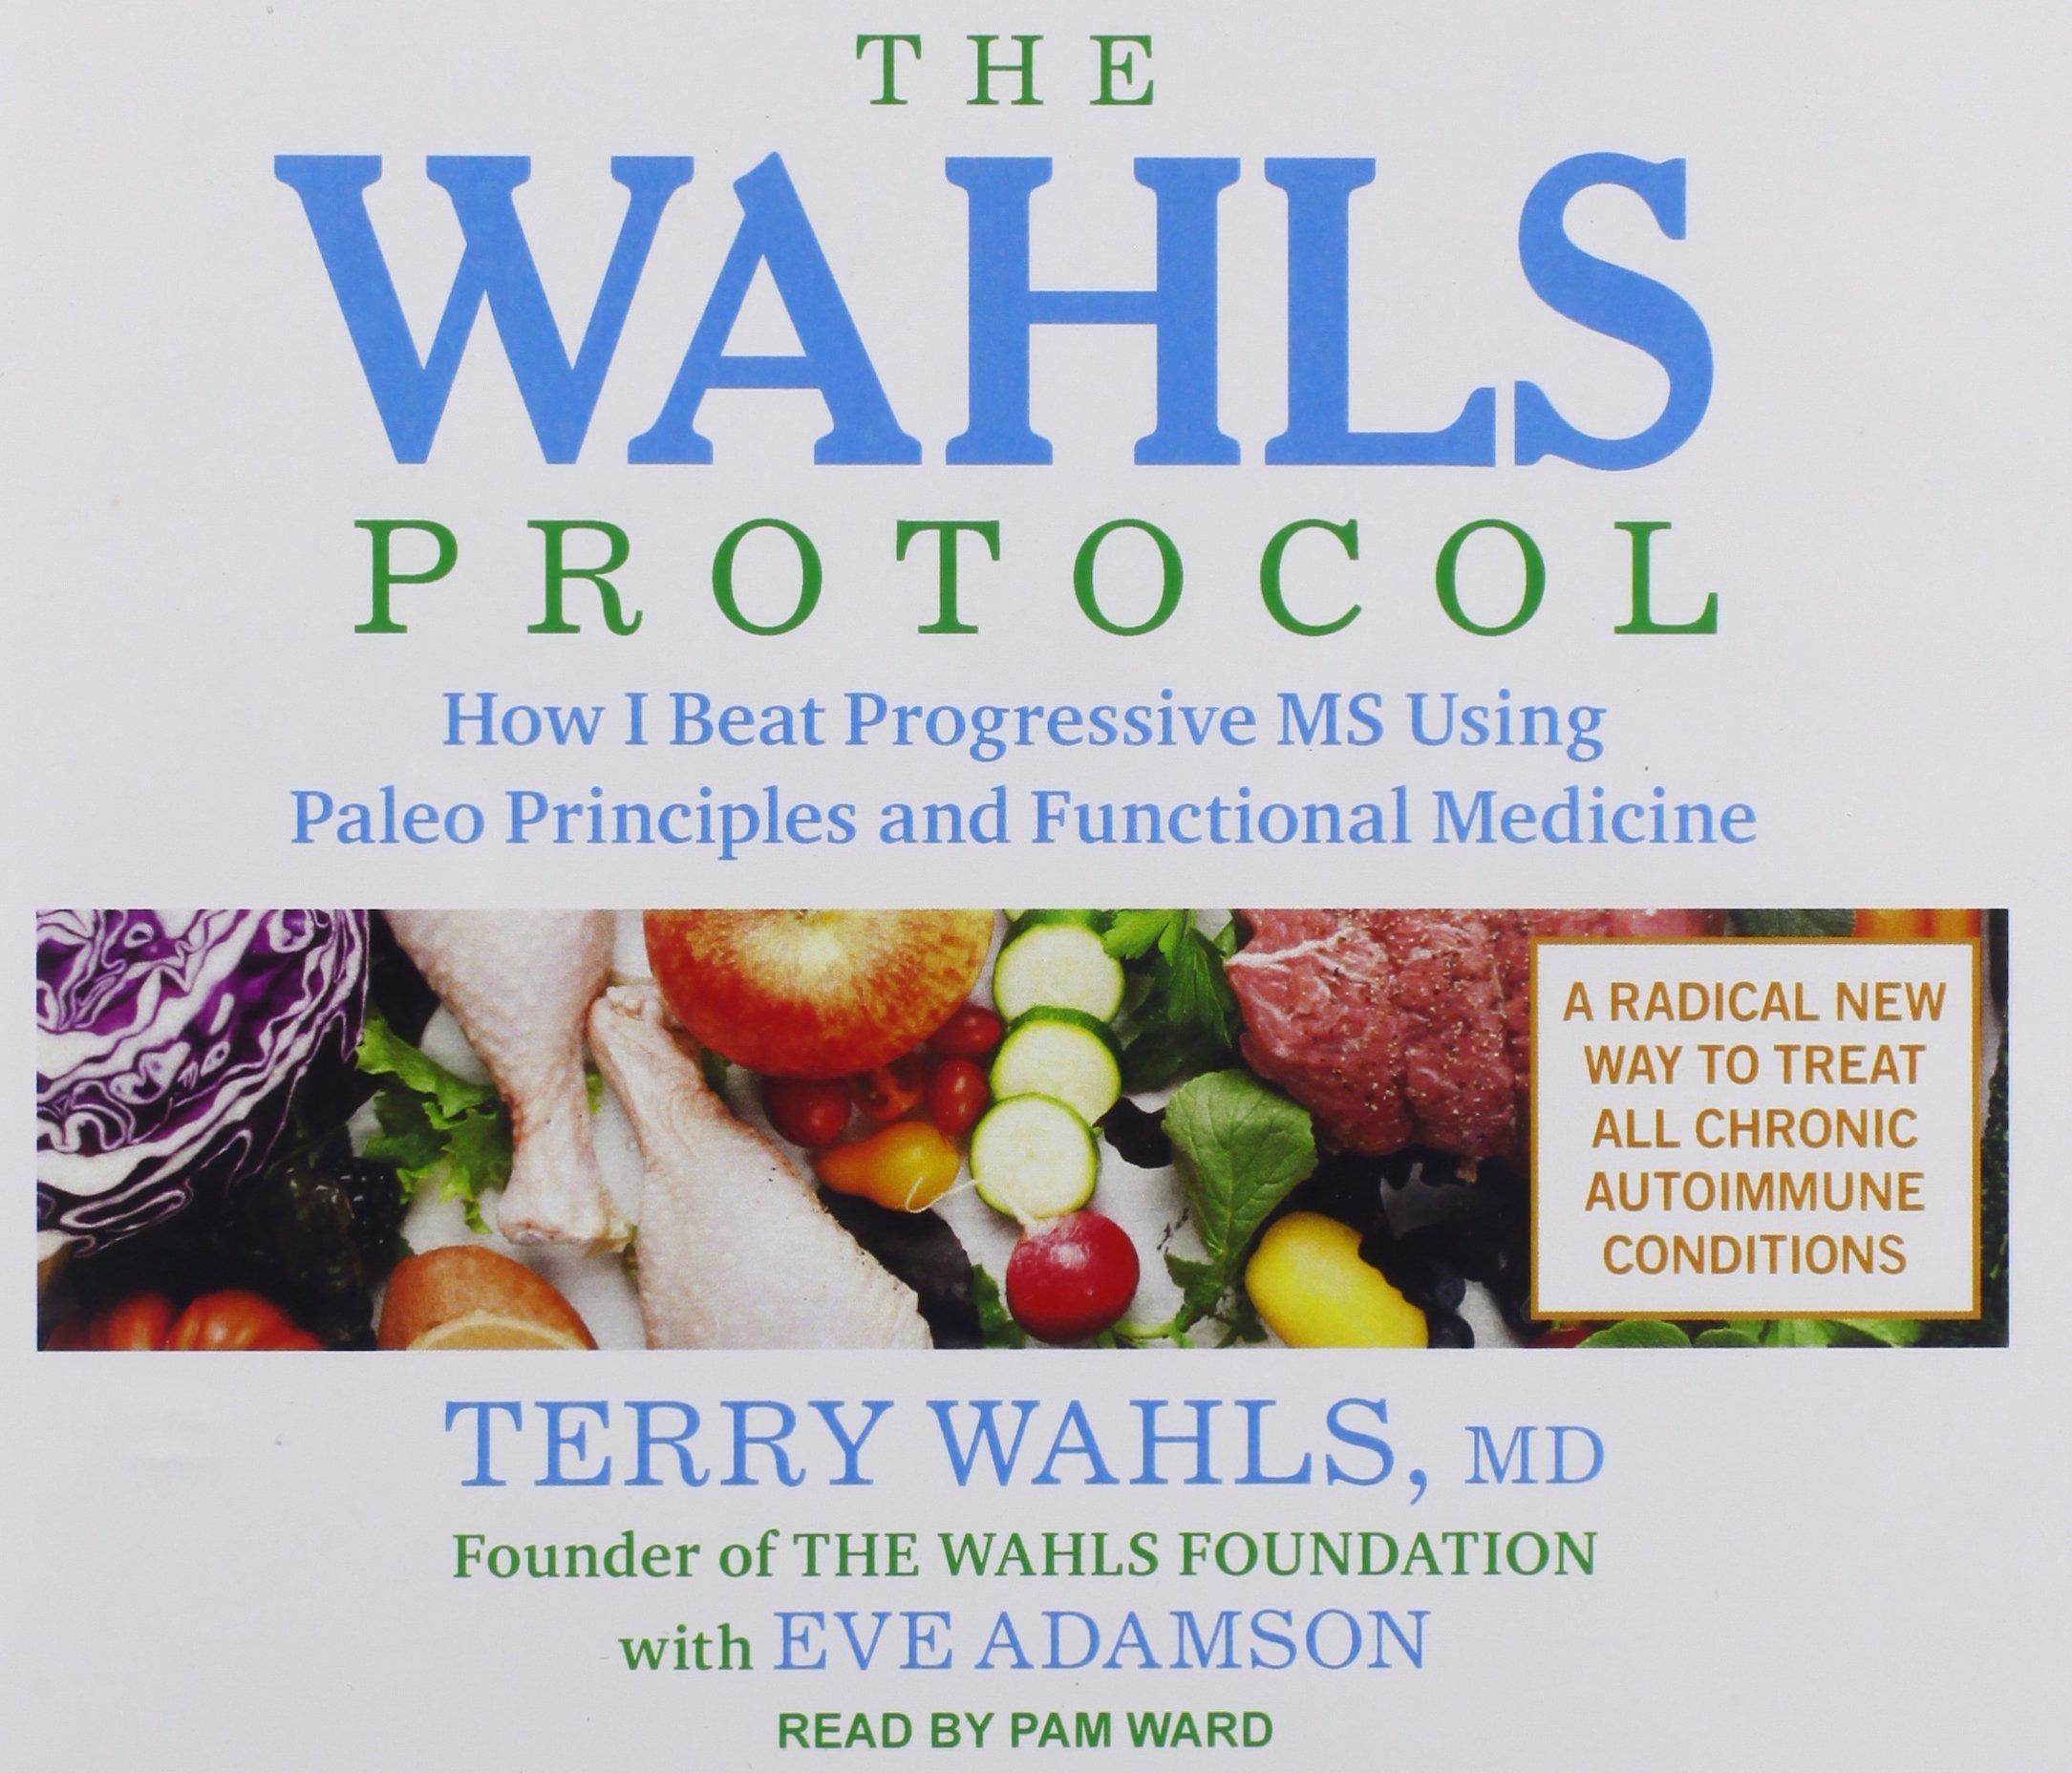 The Wahls Protocol: How I Beat Progressive MS Using Paleo Principles